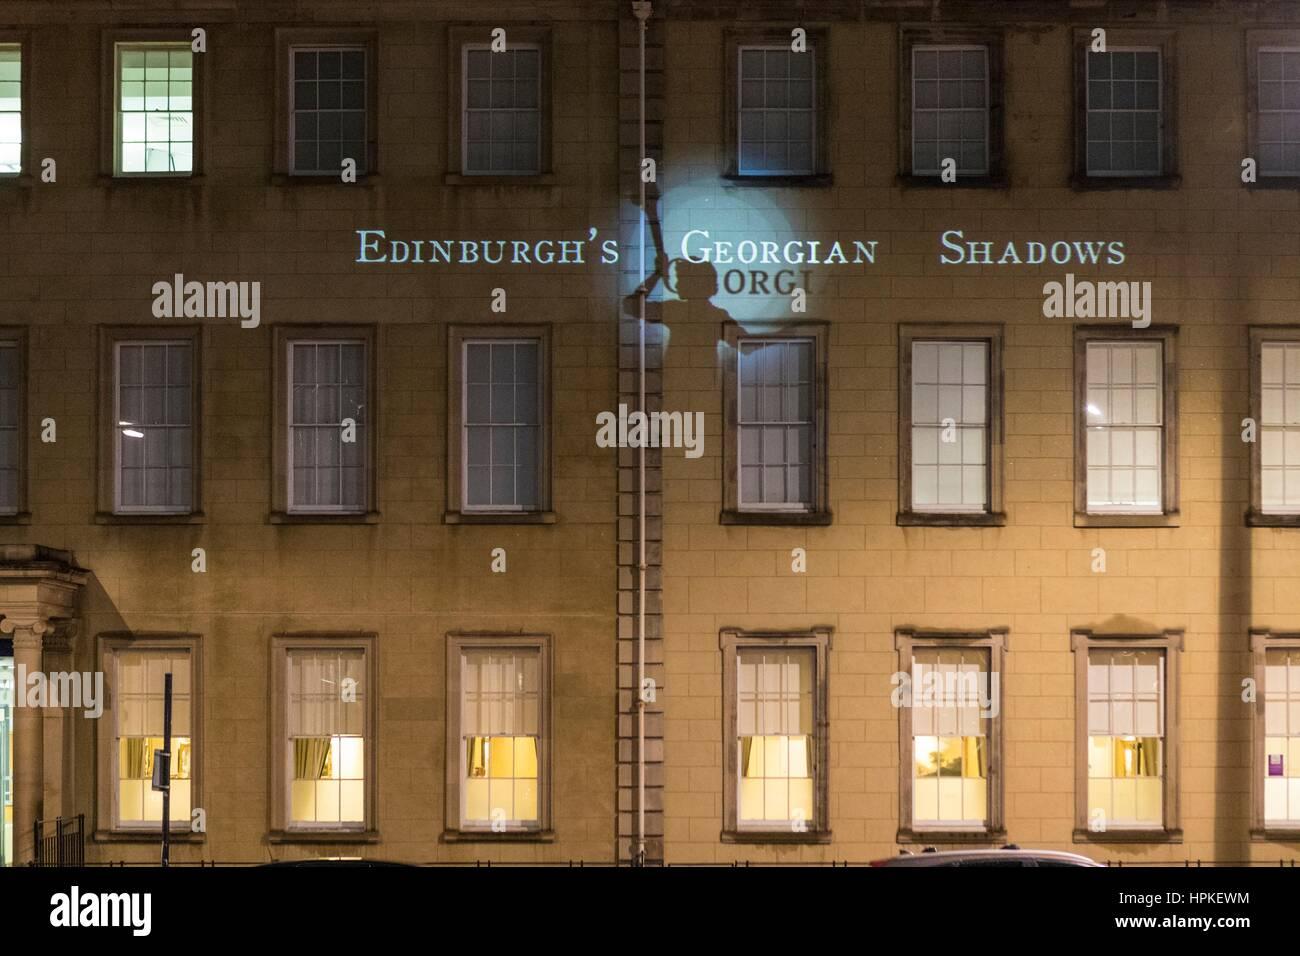 Edinburgh, Scotland, UK. 23rd February 2017. To celebrate the 250th anniversary of Edinburgh's New Town a lumiere - Stock Image